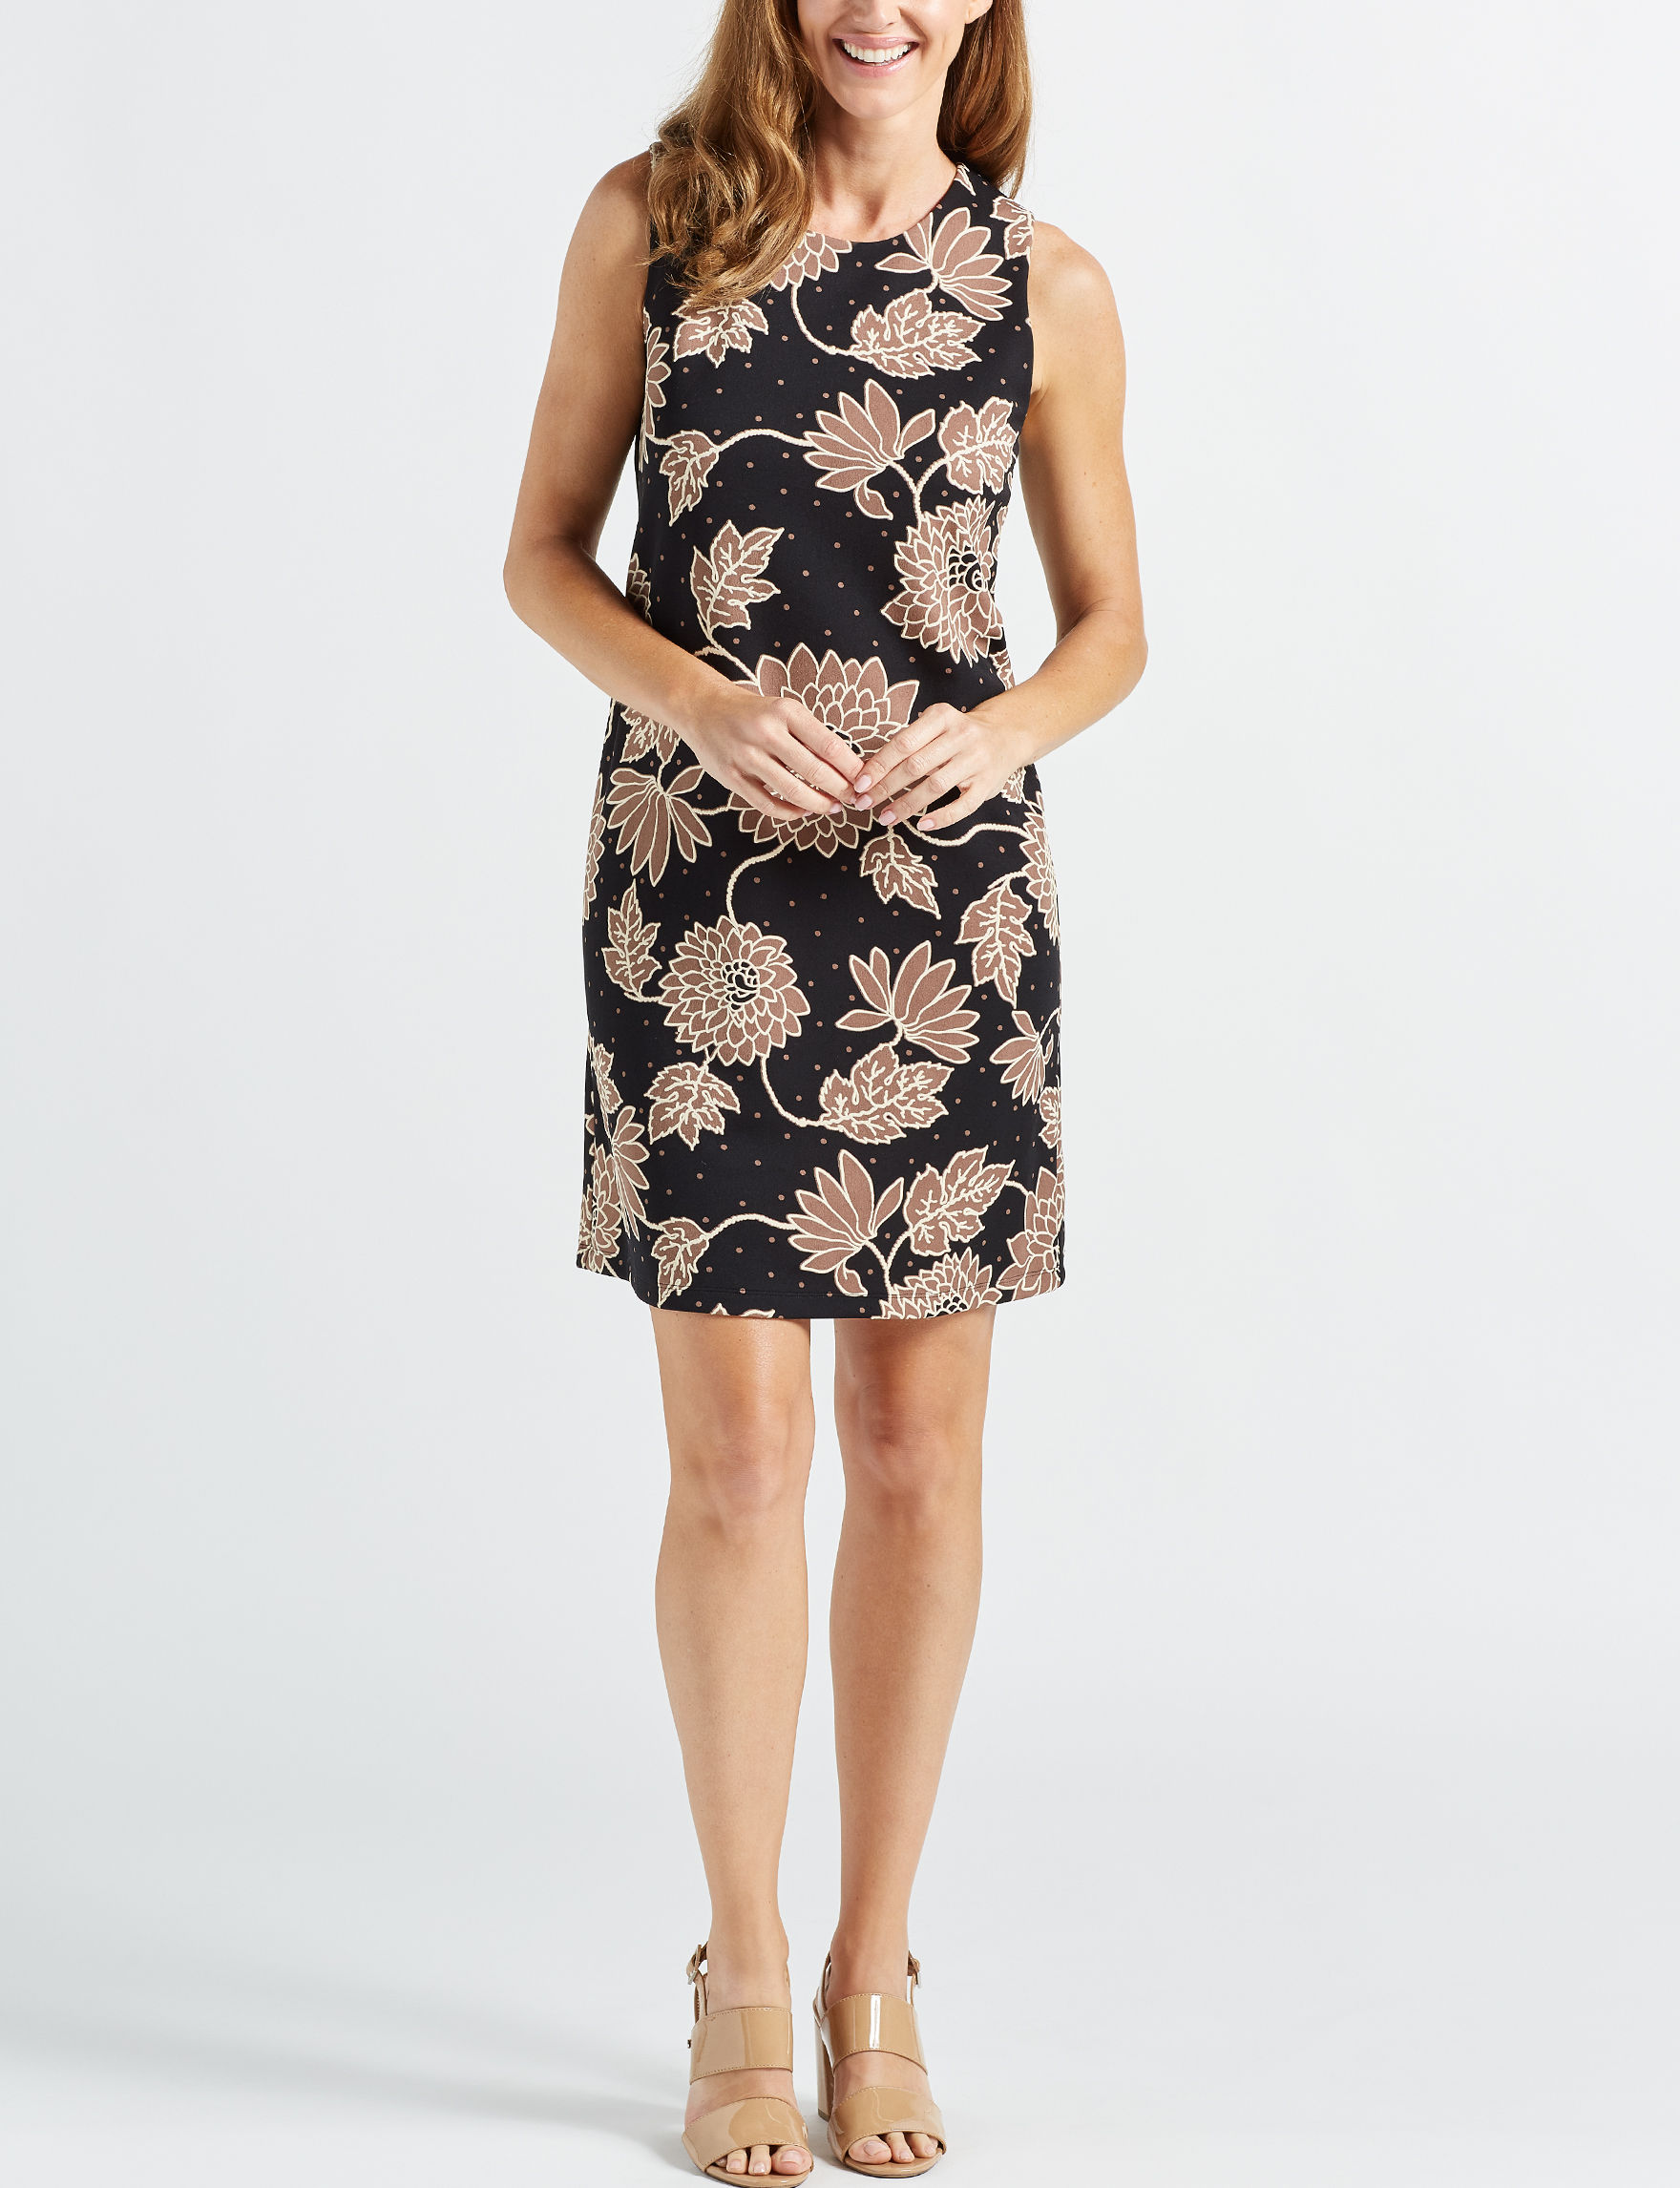 Ronni Nicole Black / Taupe Everyday & Casual Shift Dresses